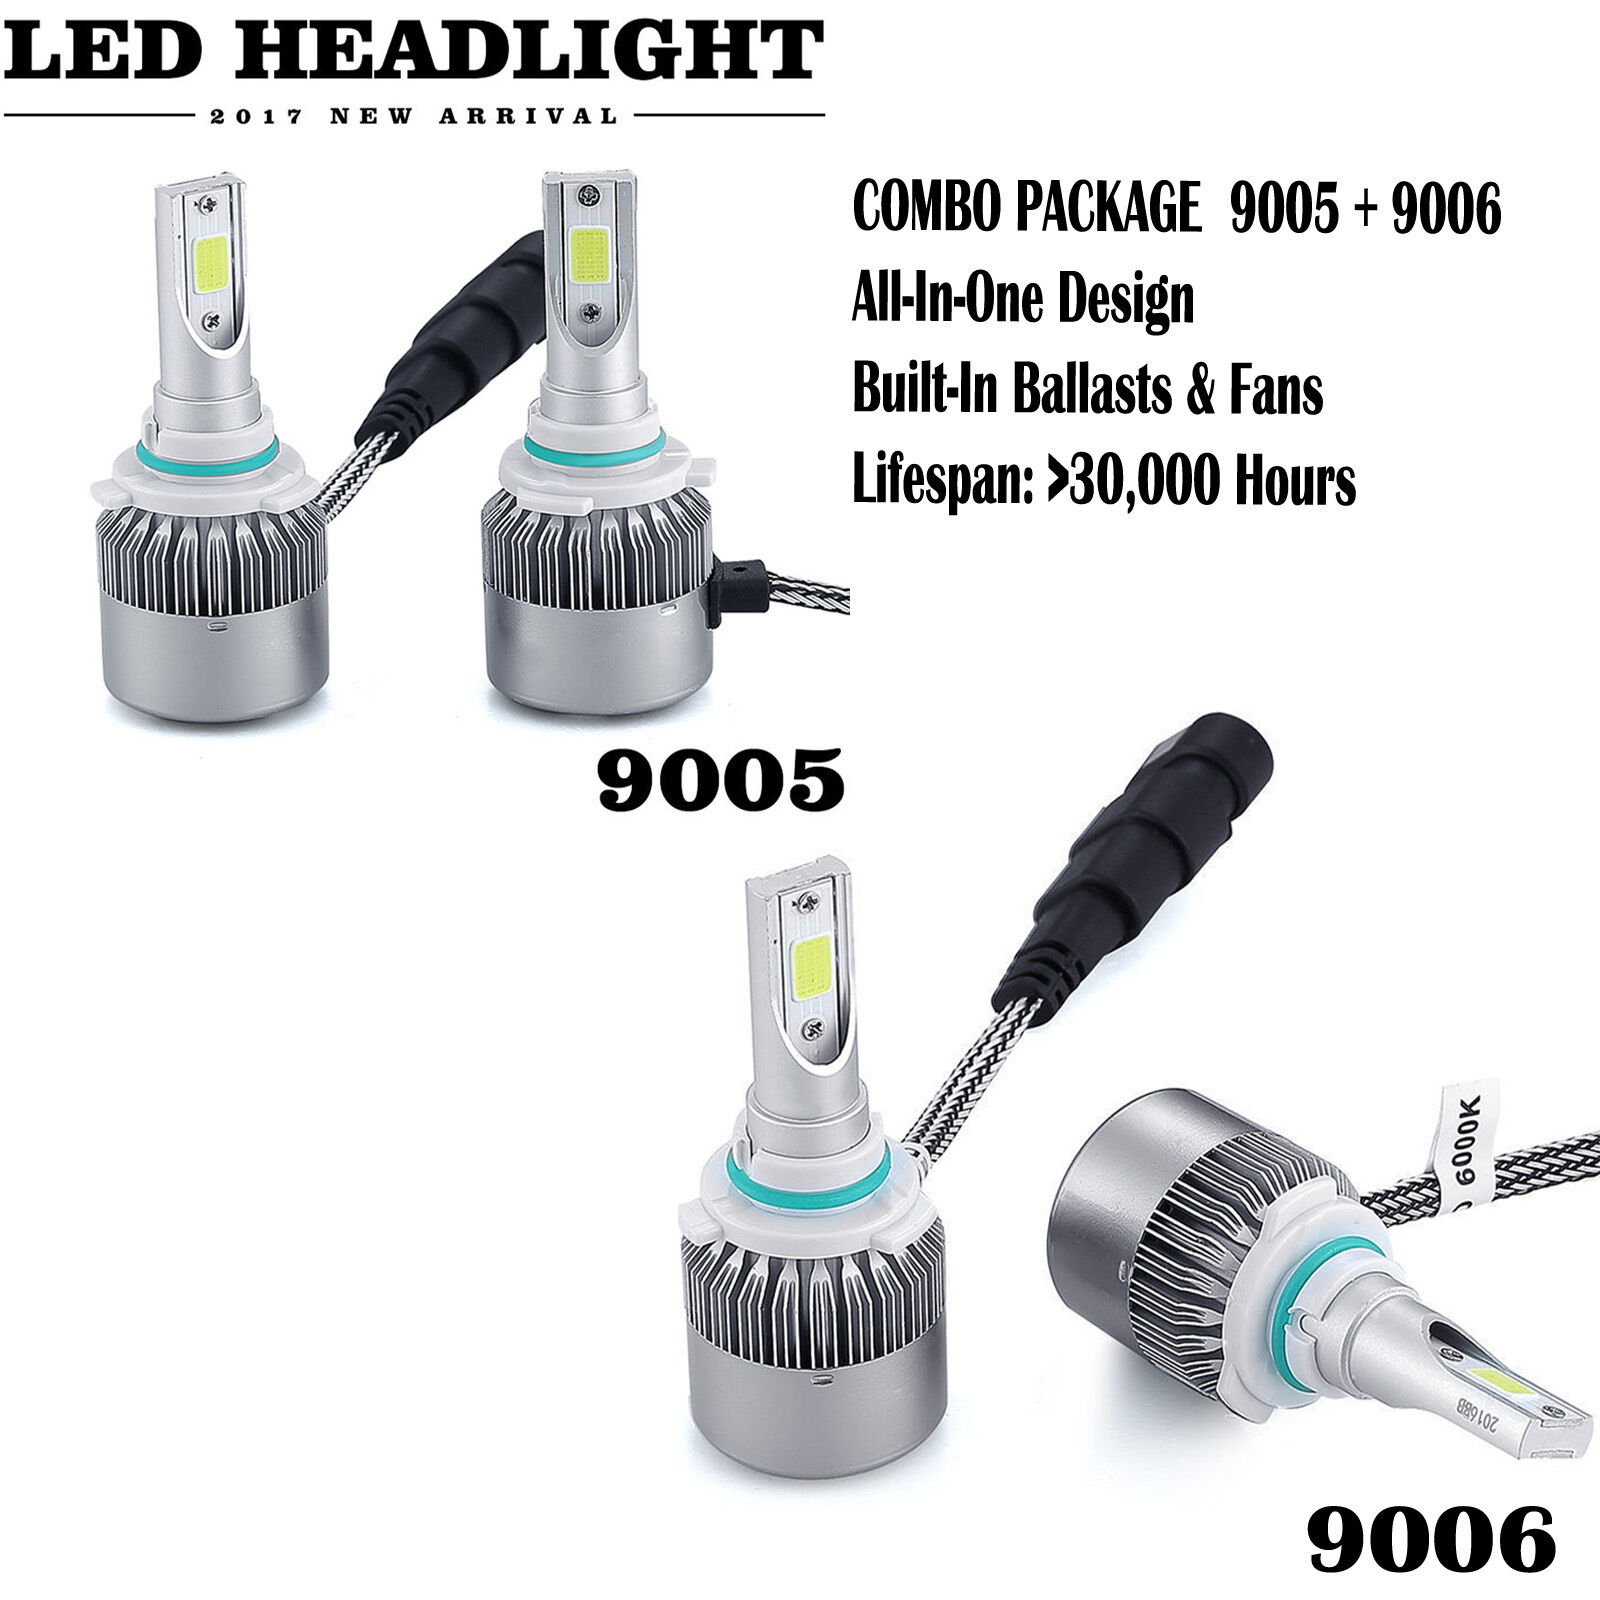 Led - 9006 9005 Total 1960W LED Headlight High Low Beam 9012 H10 Combo Kit 6000K White